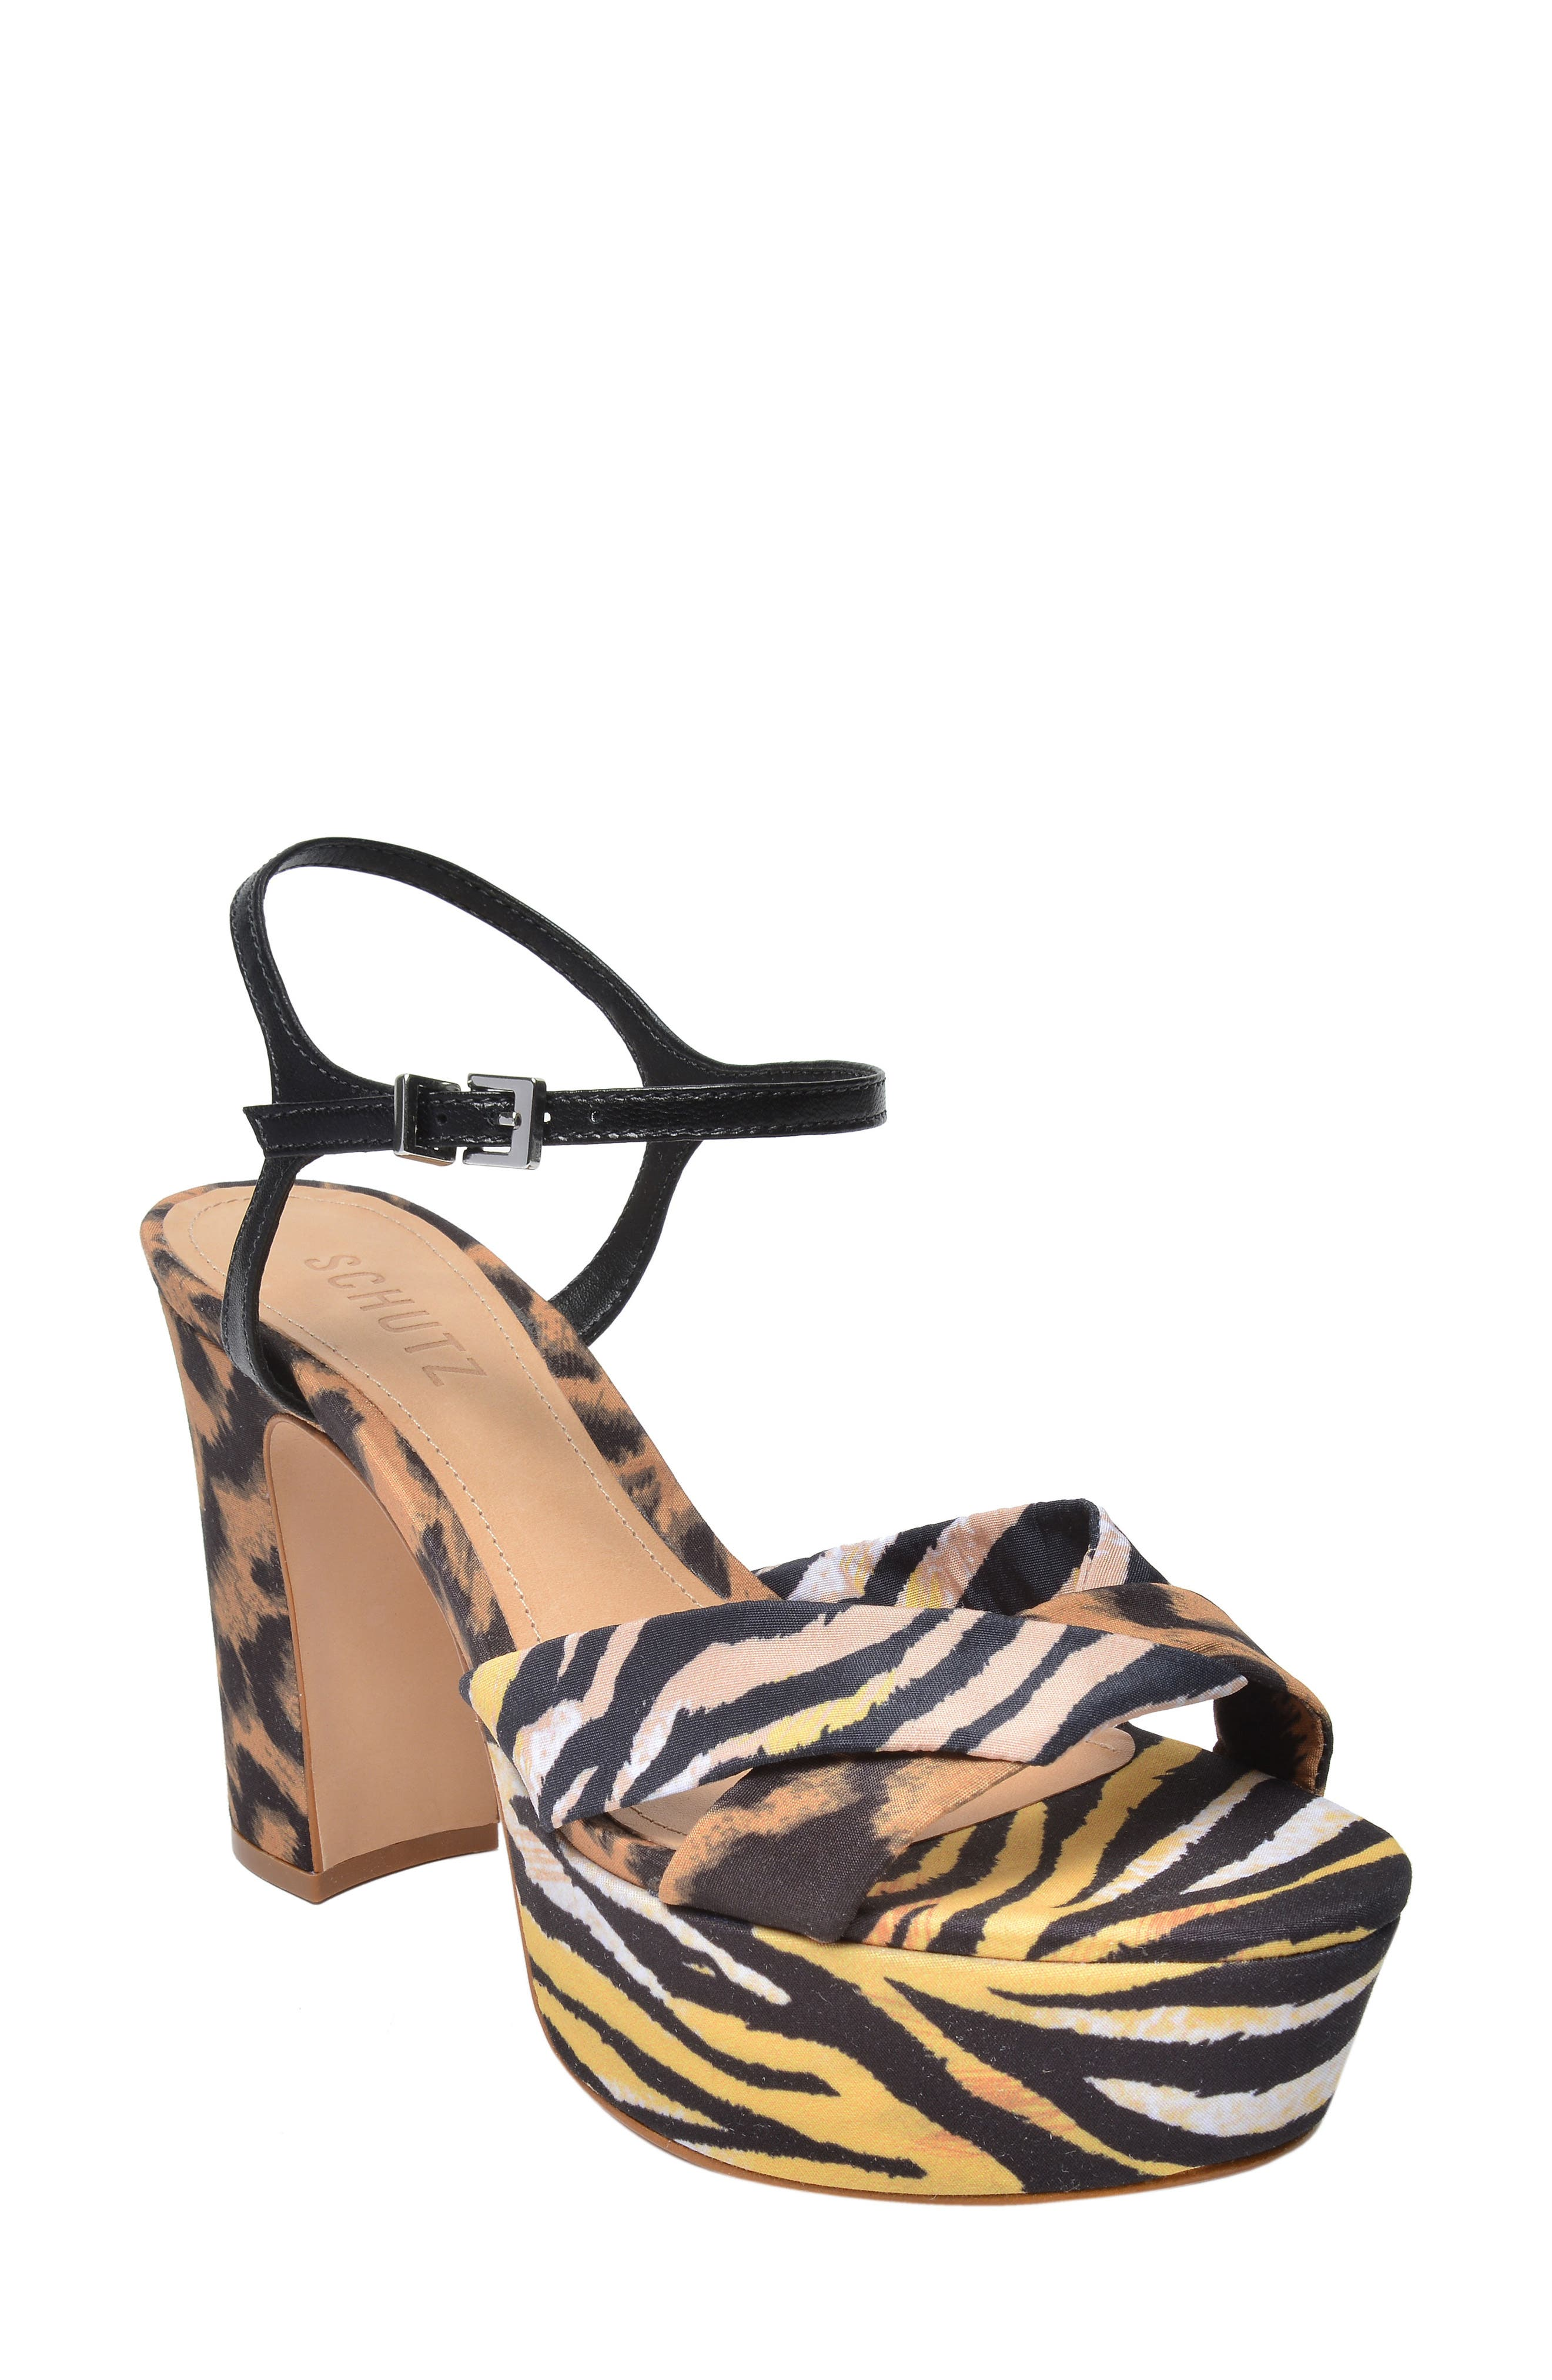 Schutz x Adriana Lima Publia Platform Sandal